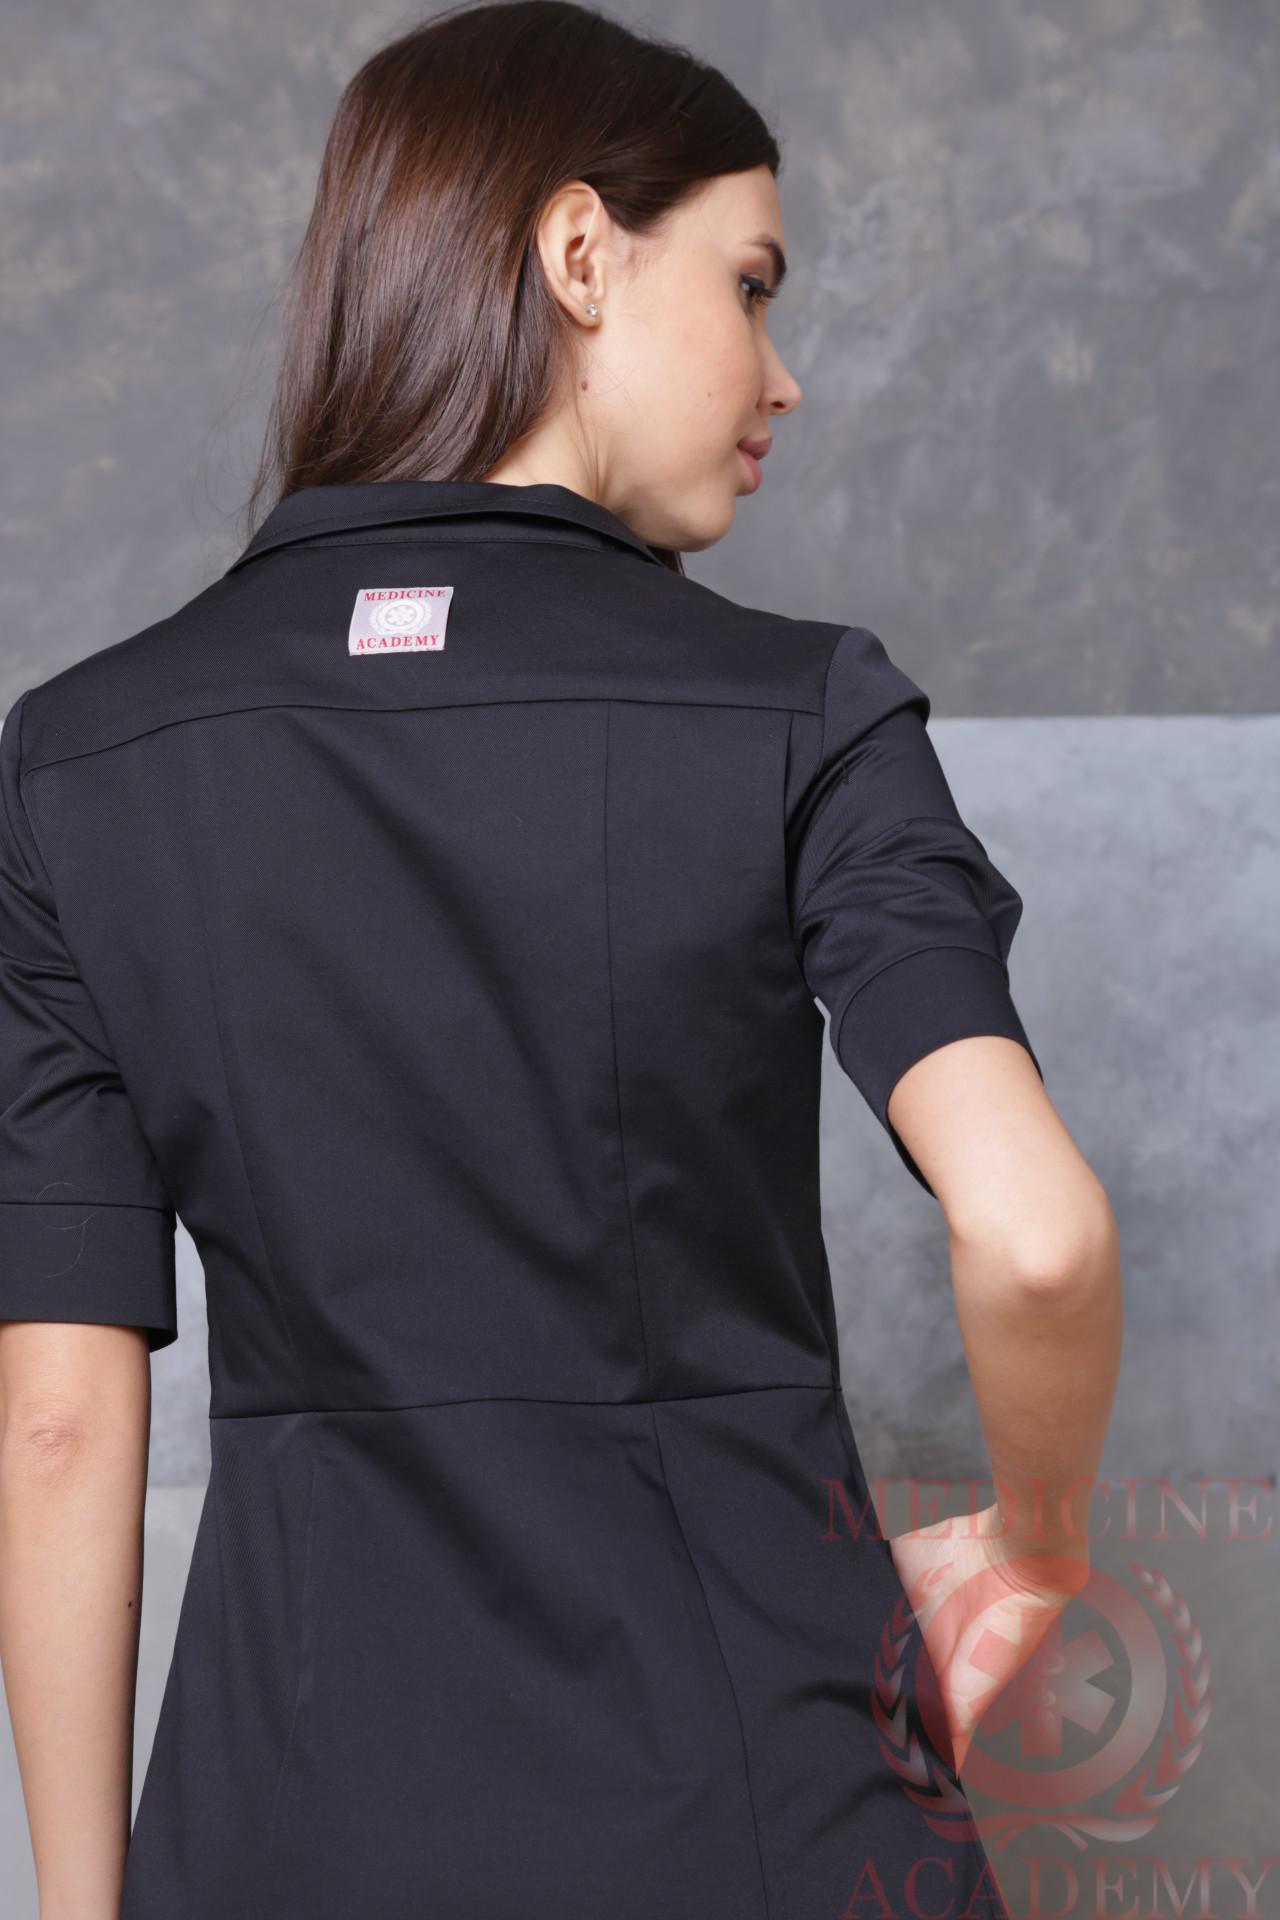 Черное платье «Диор» на молнии пф035чм 77ma.ru